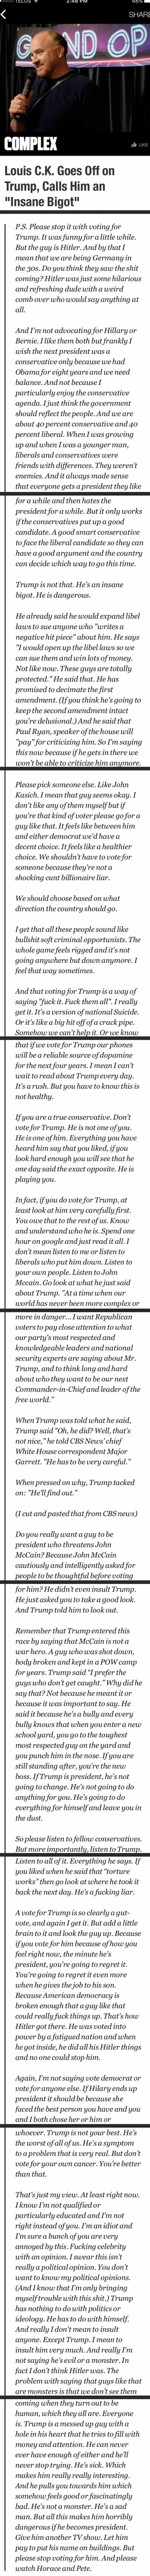 Louis CK On Trump http://ibeebz.com